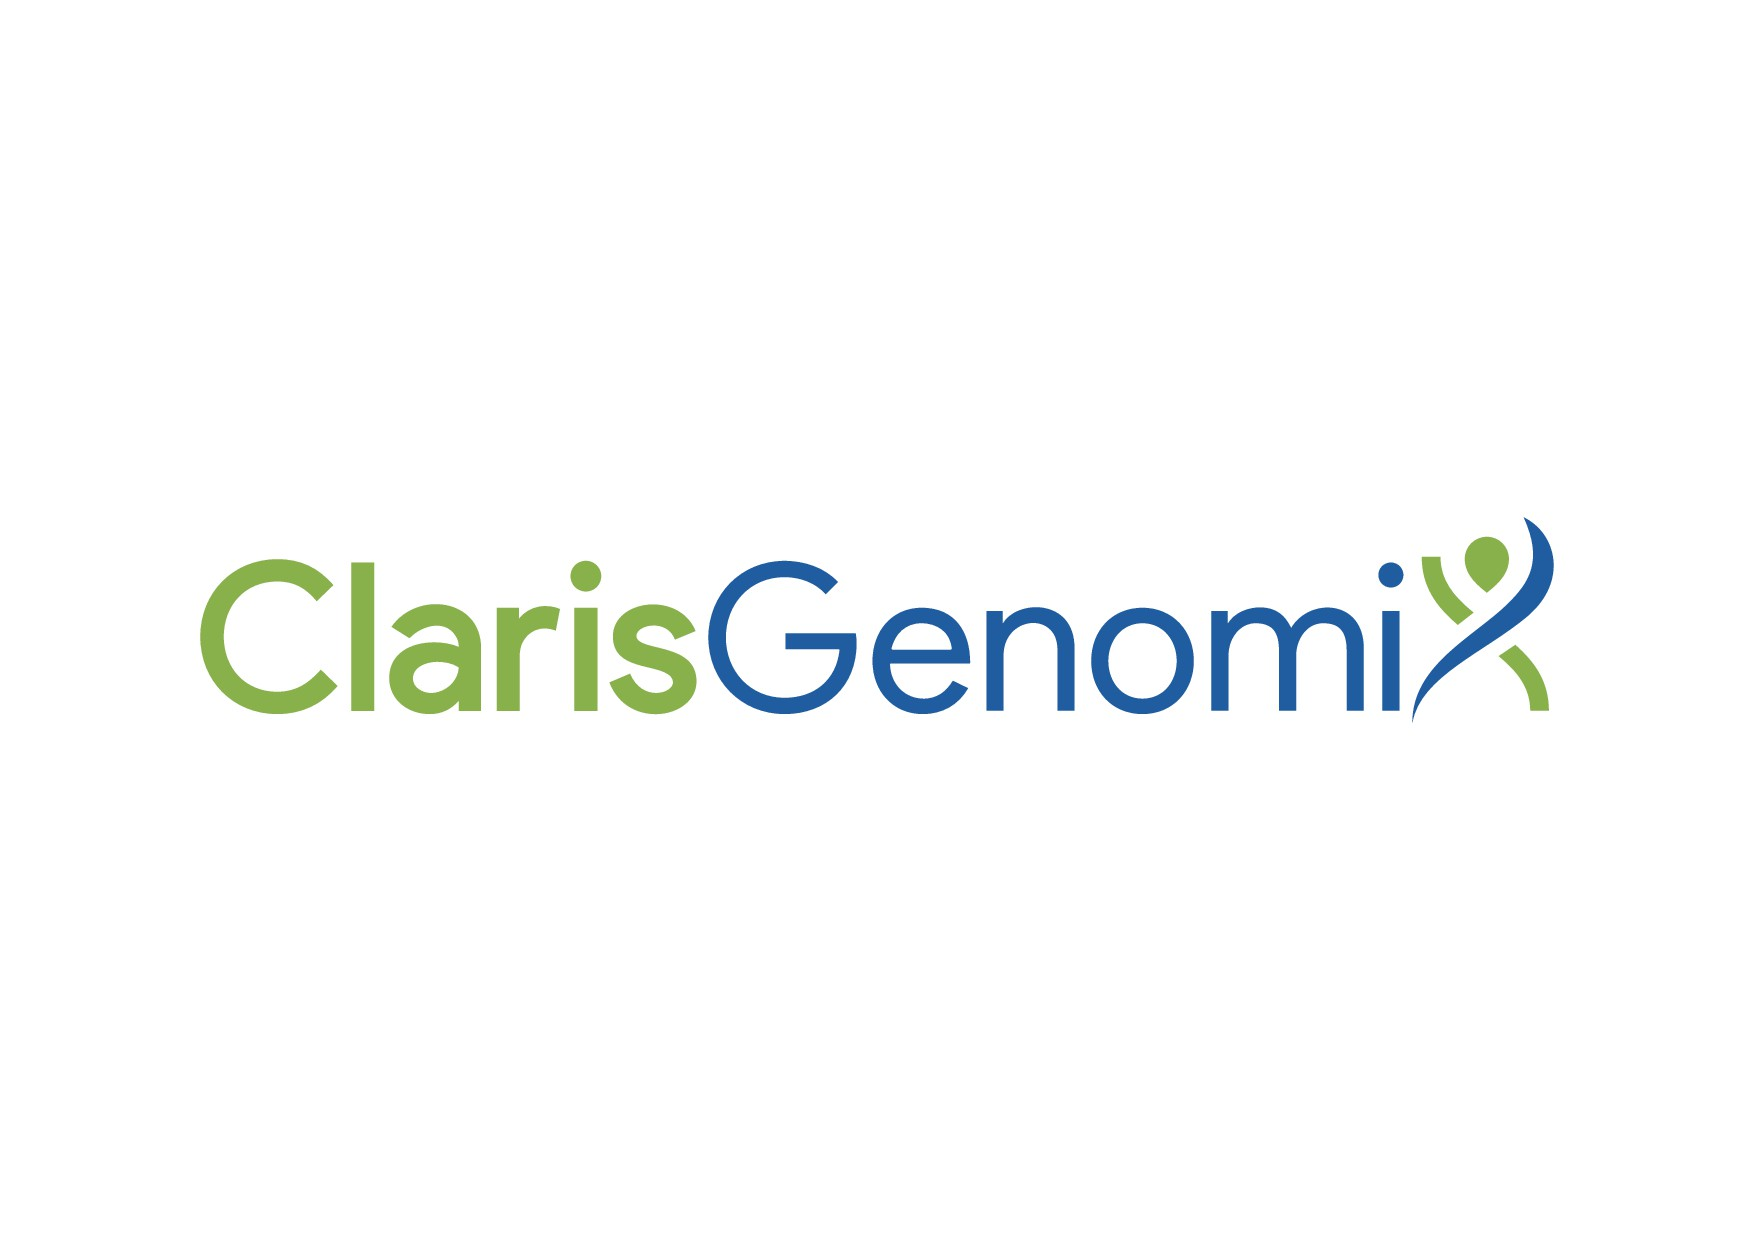 Help a diagnostic genomics startup improve the lives of cancer patients